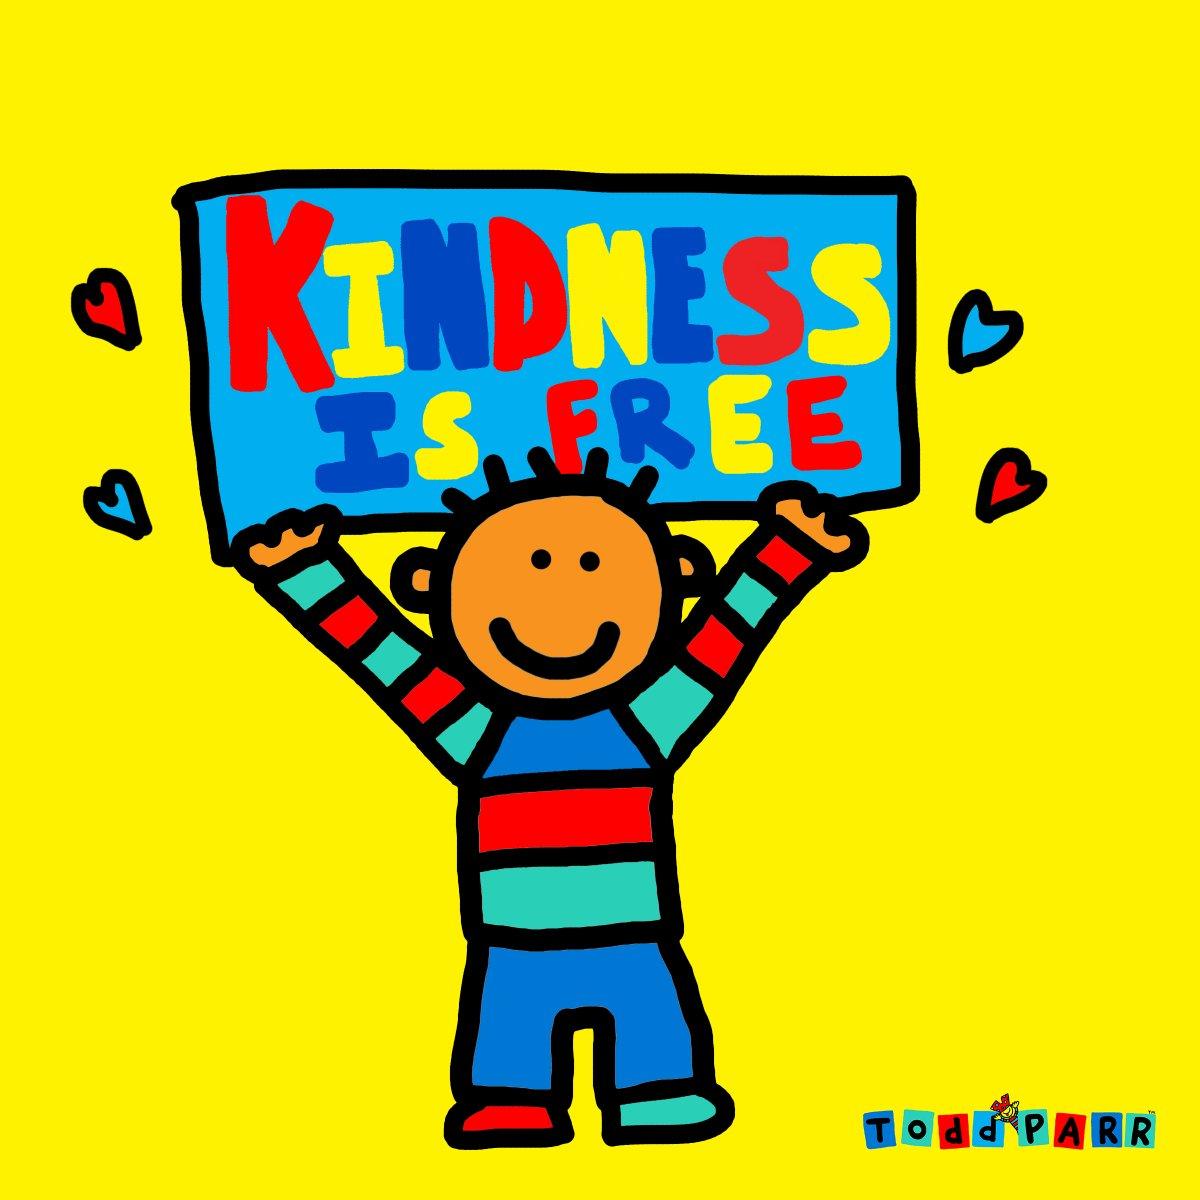 Kindness is FREE. Love, Todd #KindnessMatters #kindnesswins #love #kidlitart #read https://t.co/ZWckPMQPKr